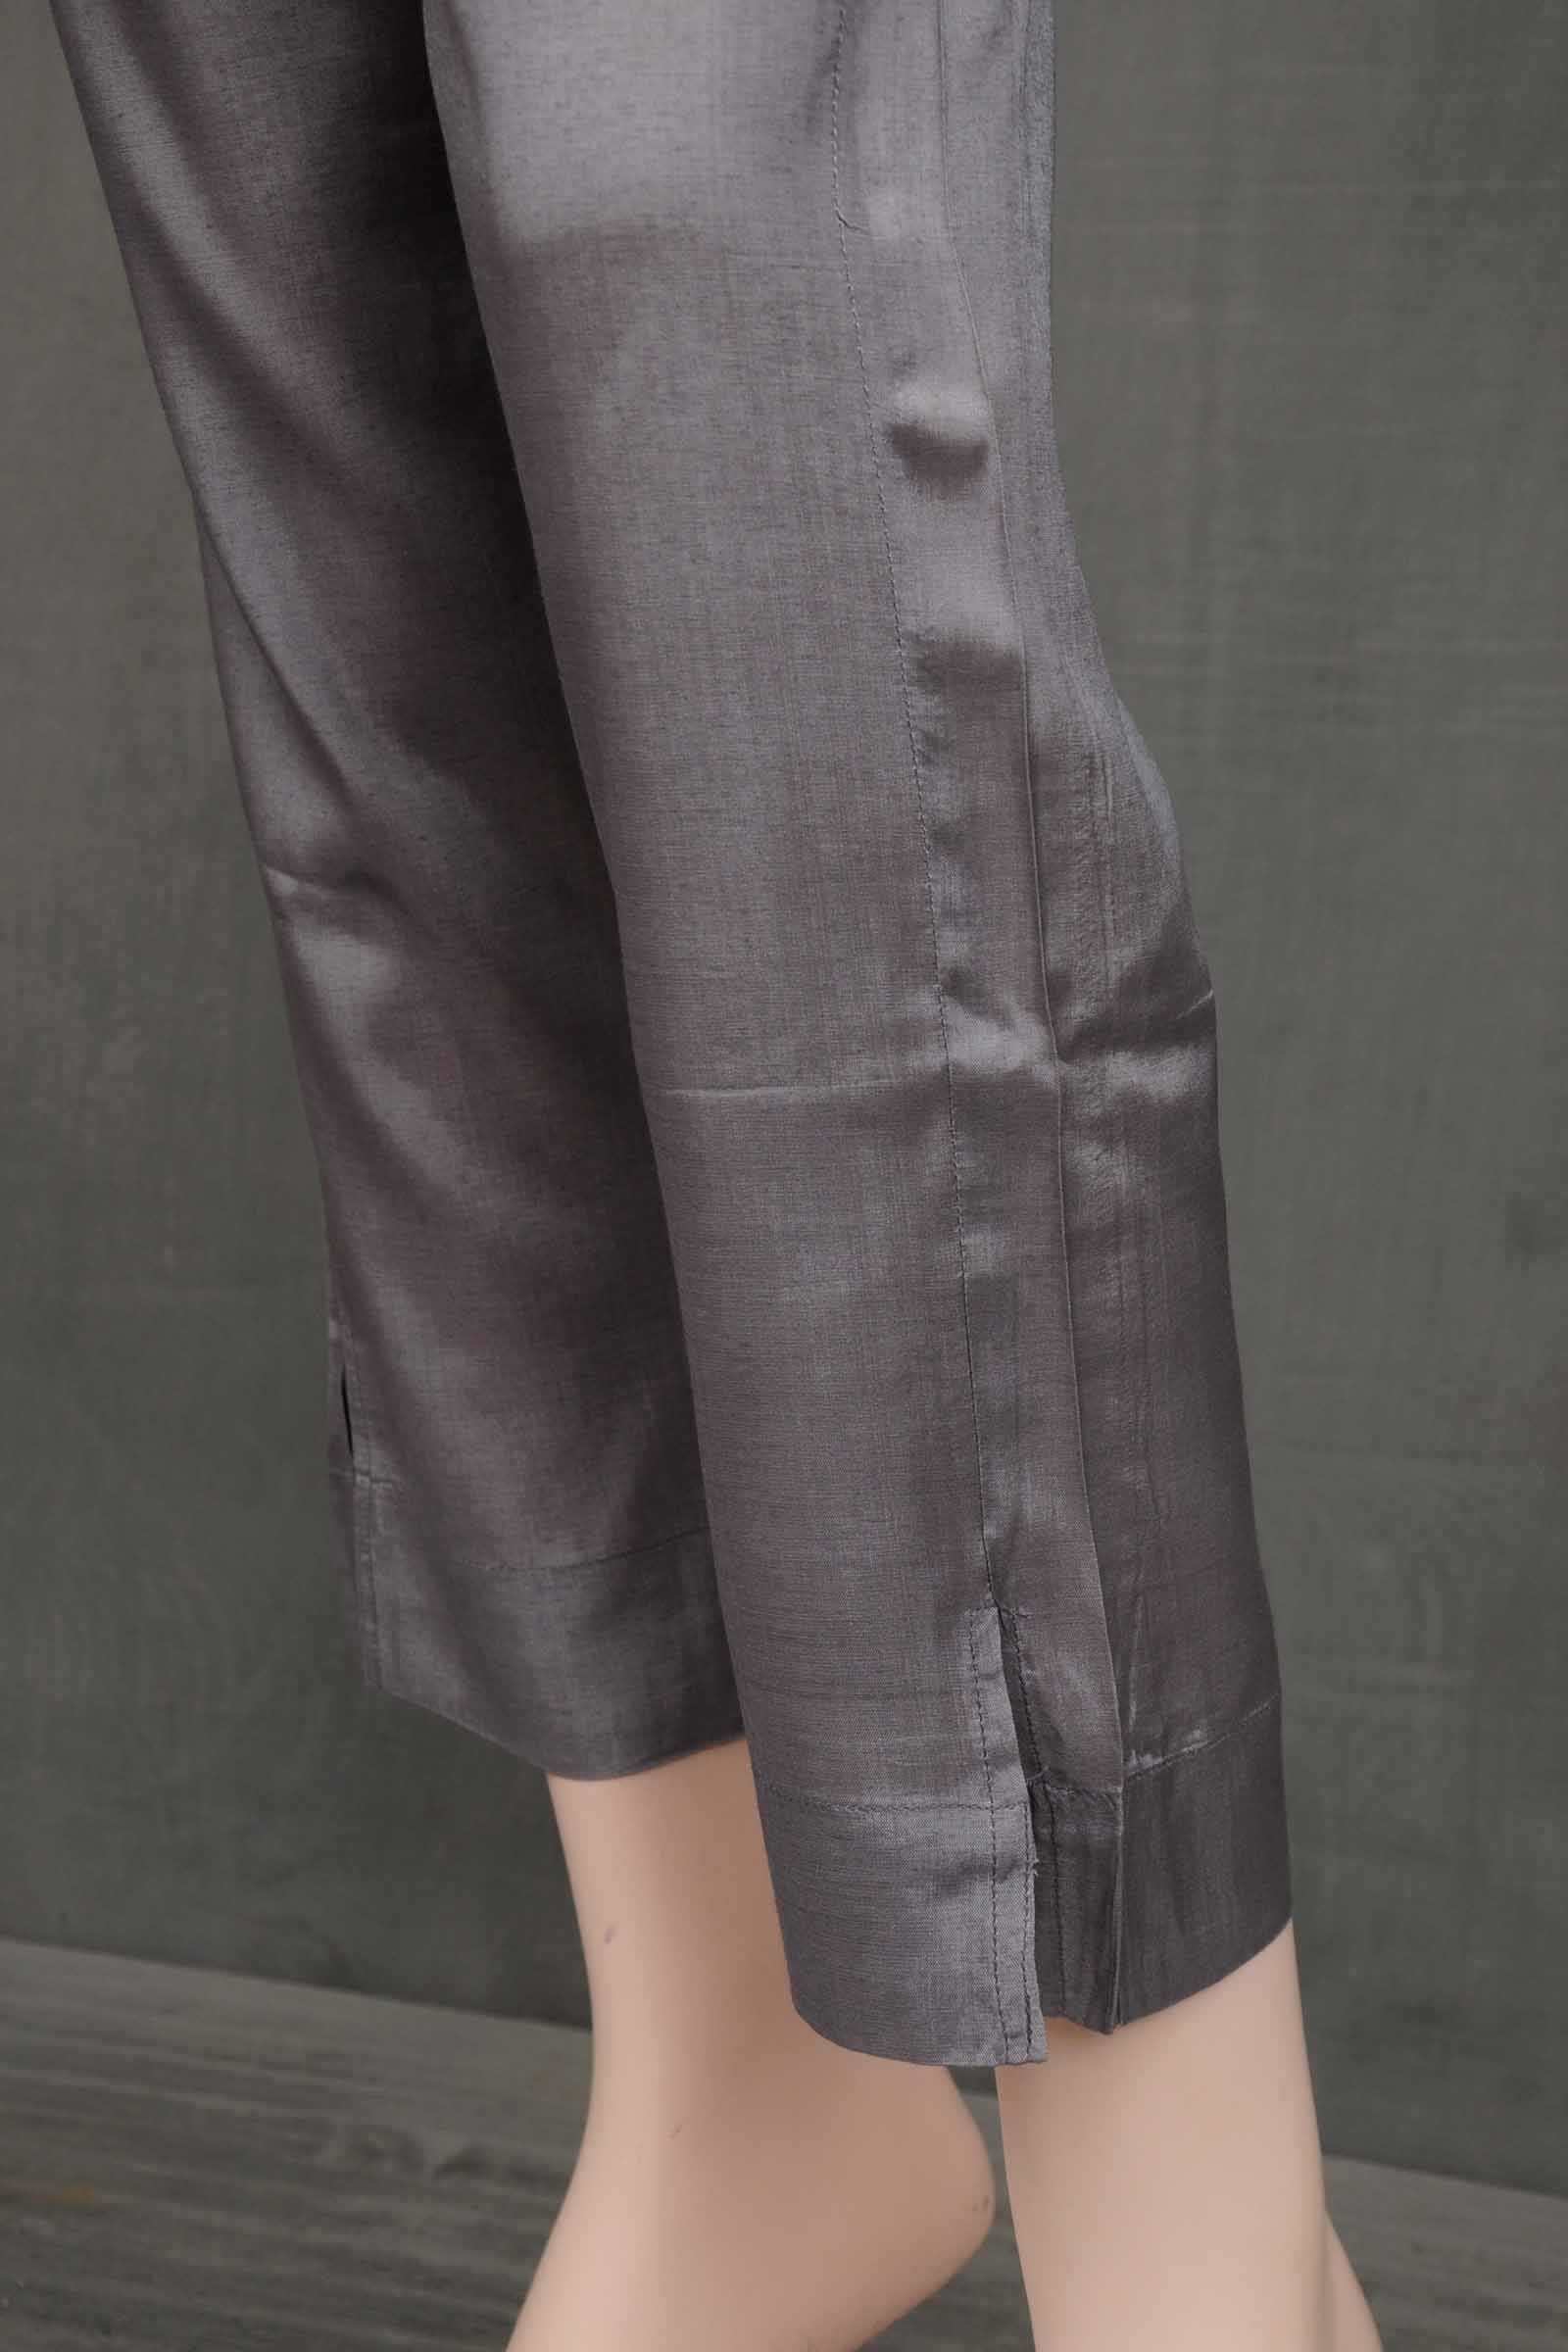 French Elegance Assam SIlk Cigarette Pant